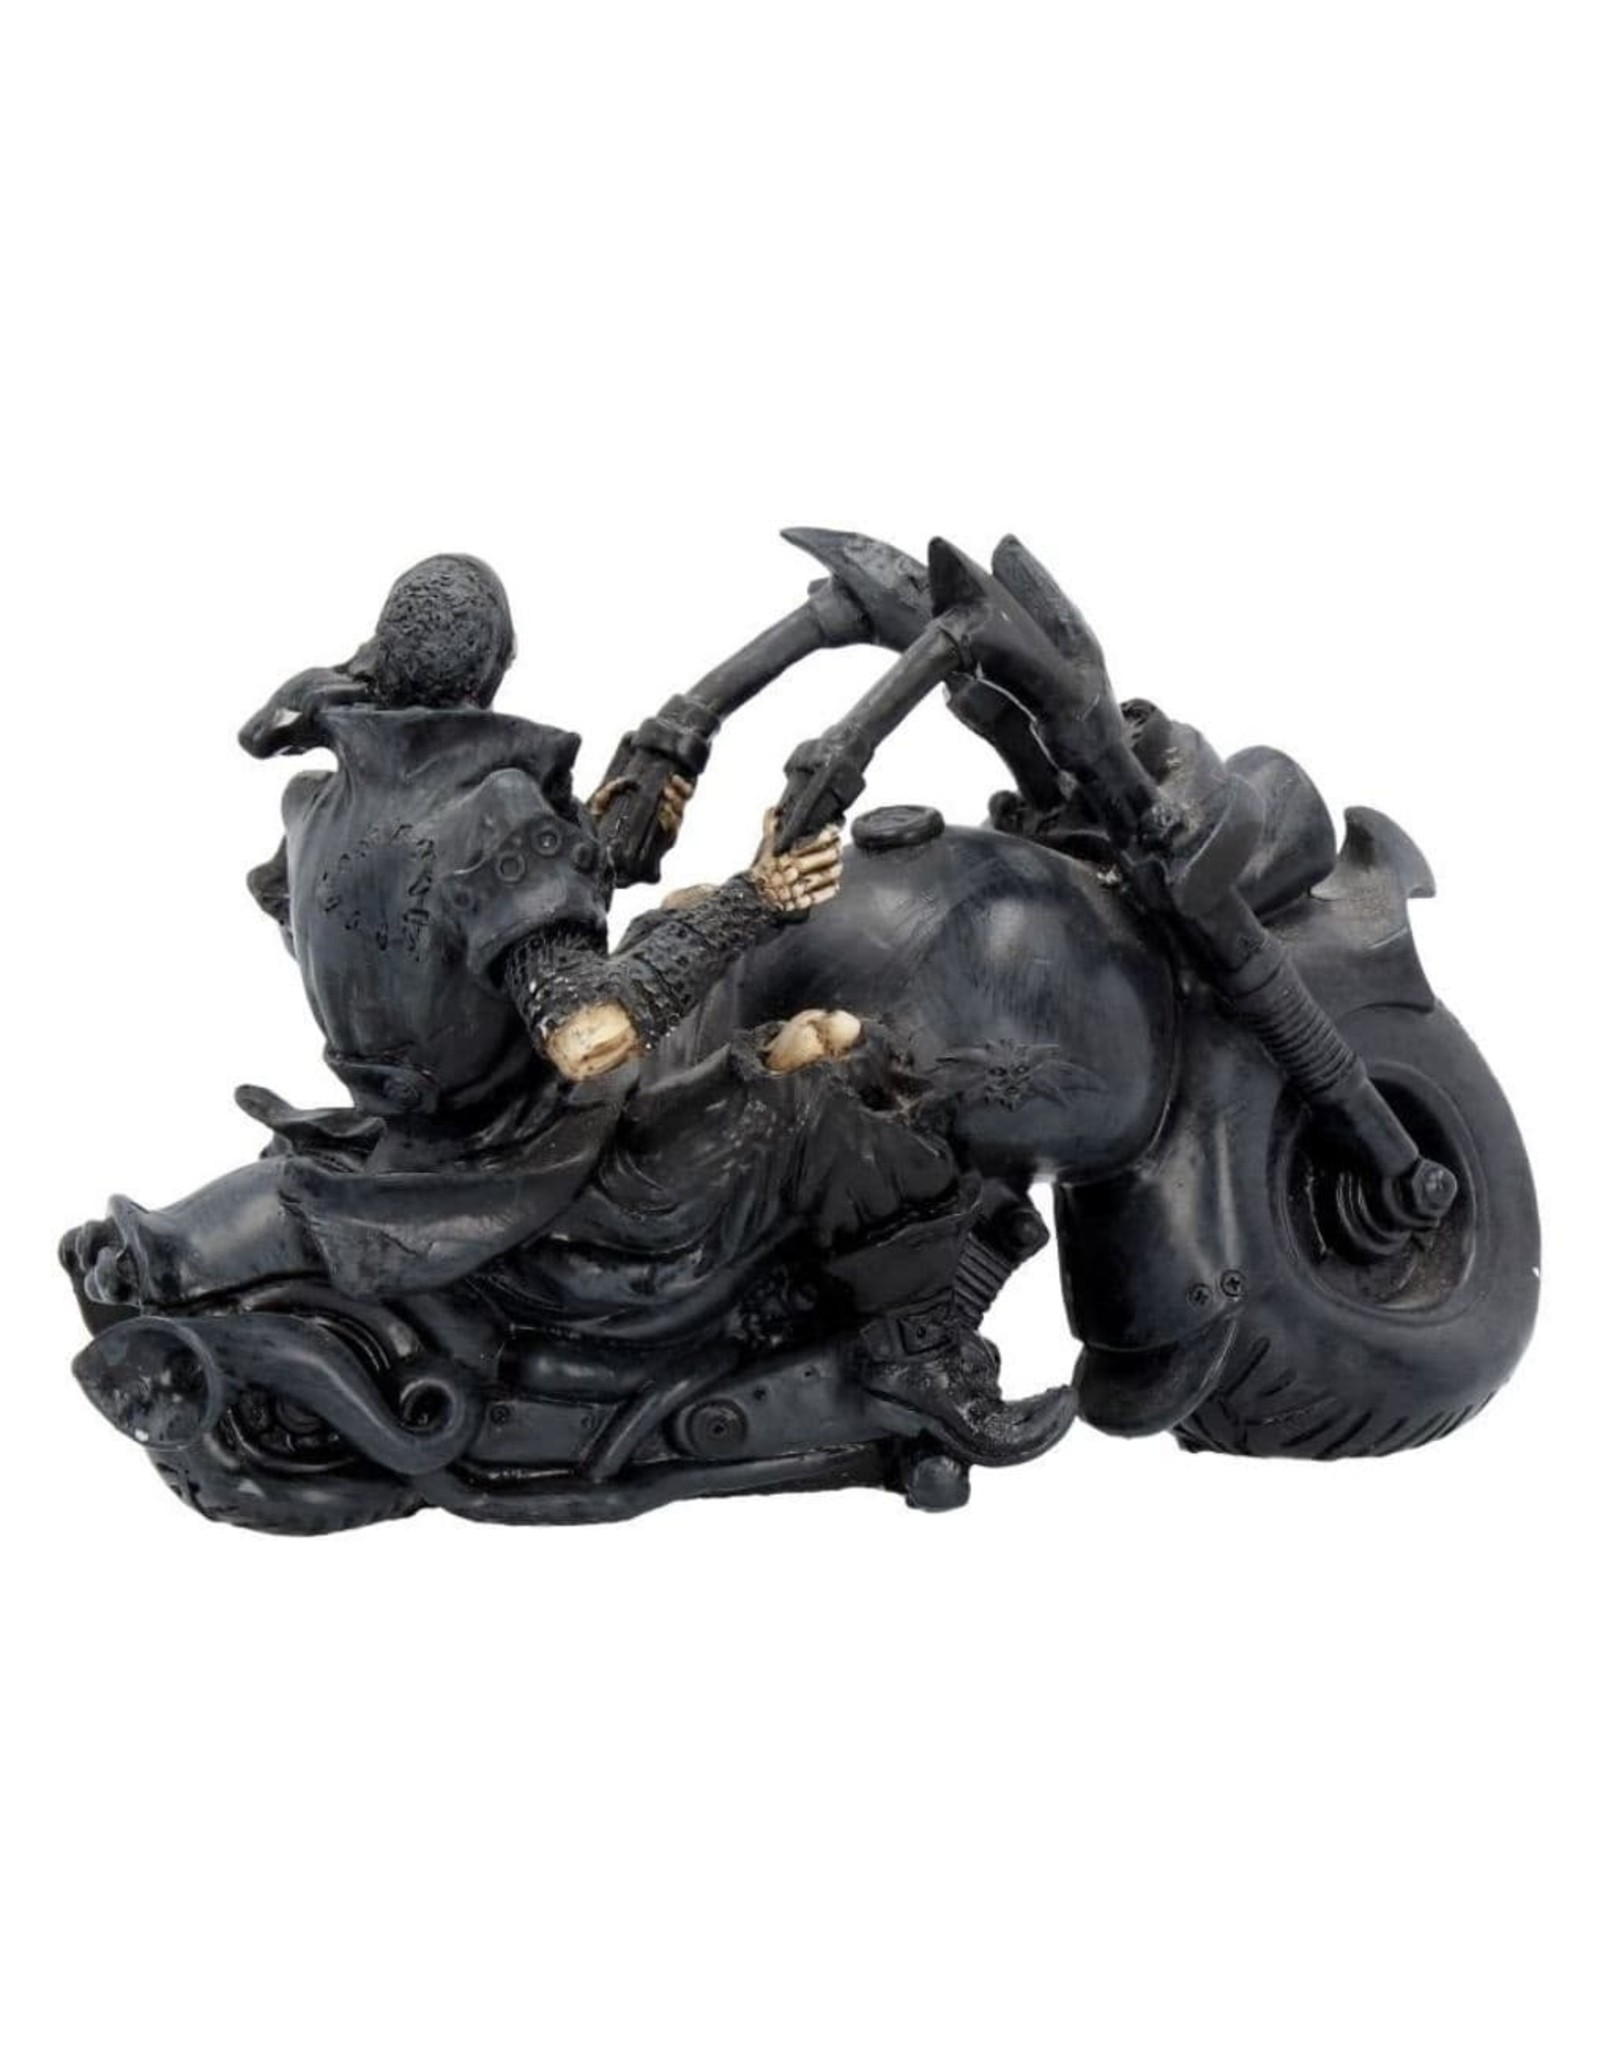 Nemesis Mow Collectables - Skeleton on the Motorcycle Screaming Wheels - Nemesis Now